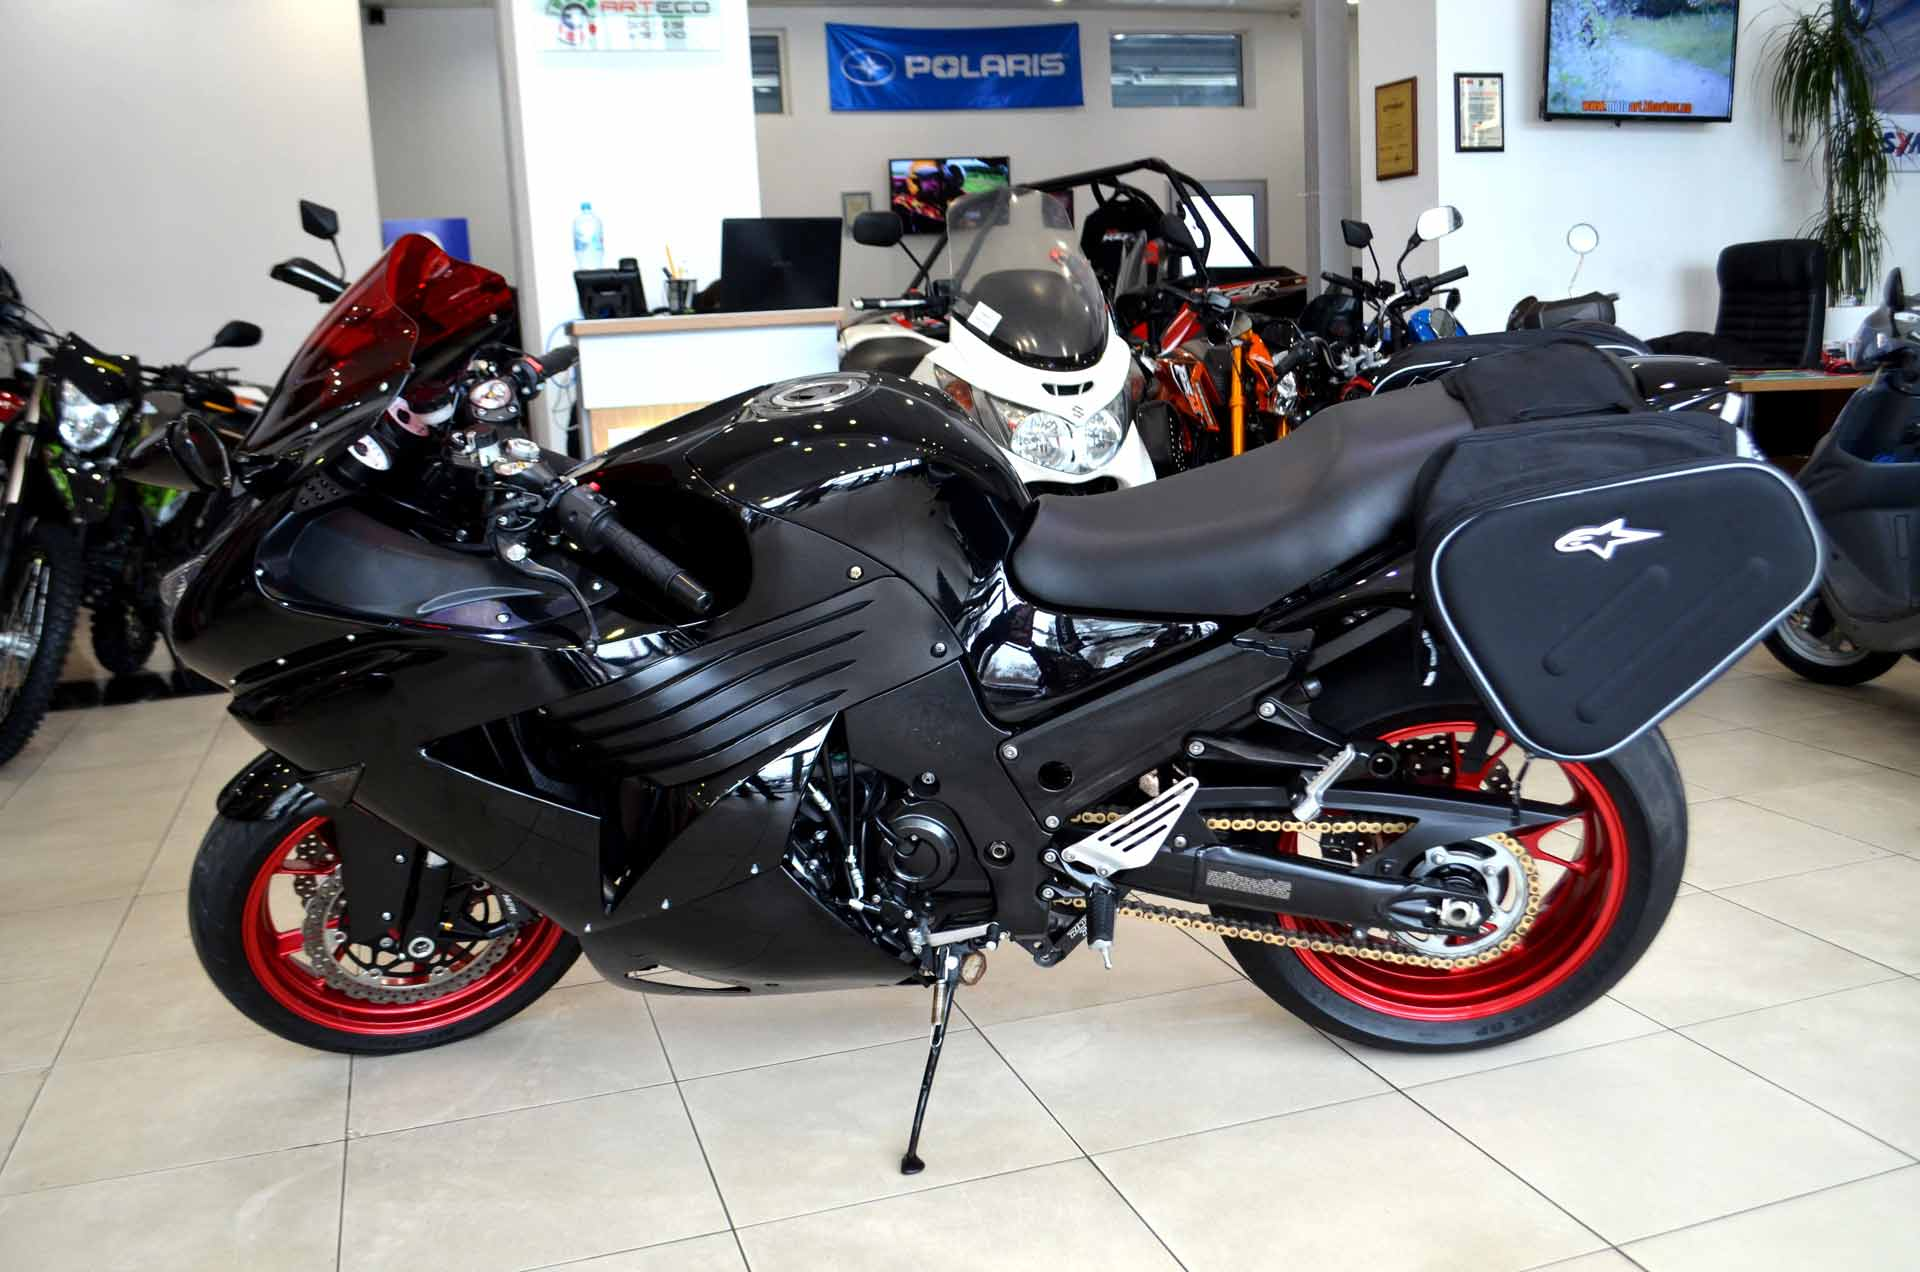 МОТОЦИКЛ KAWASAKI NINJA ZX-14 (ZZR 1400) ― Артмото - купить квадроцикл в украине и харькове, мотоцикл, снегоход, скутер, мопед, электромобиль